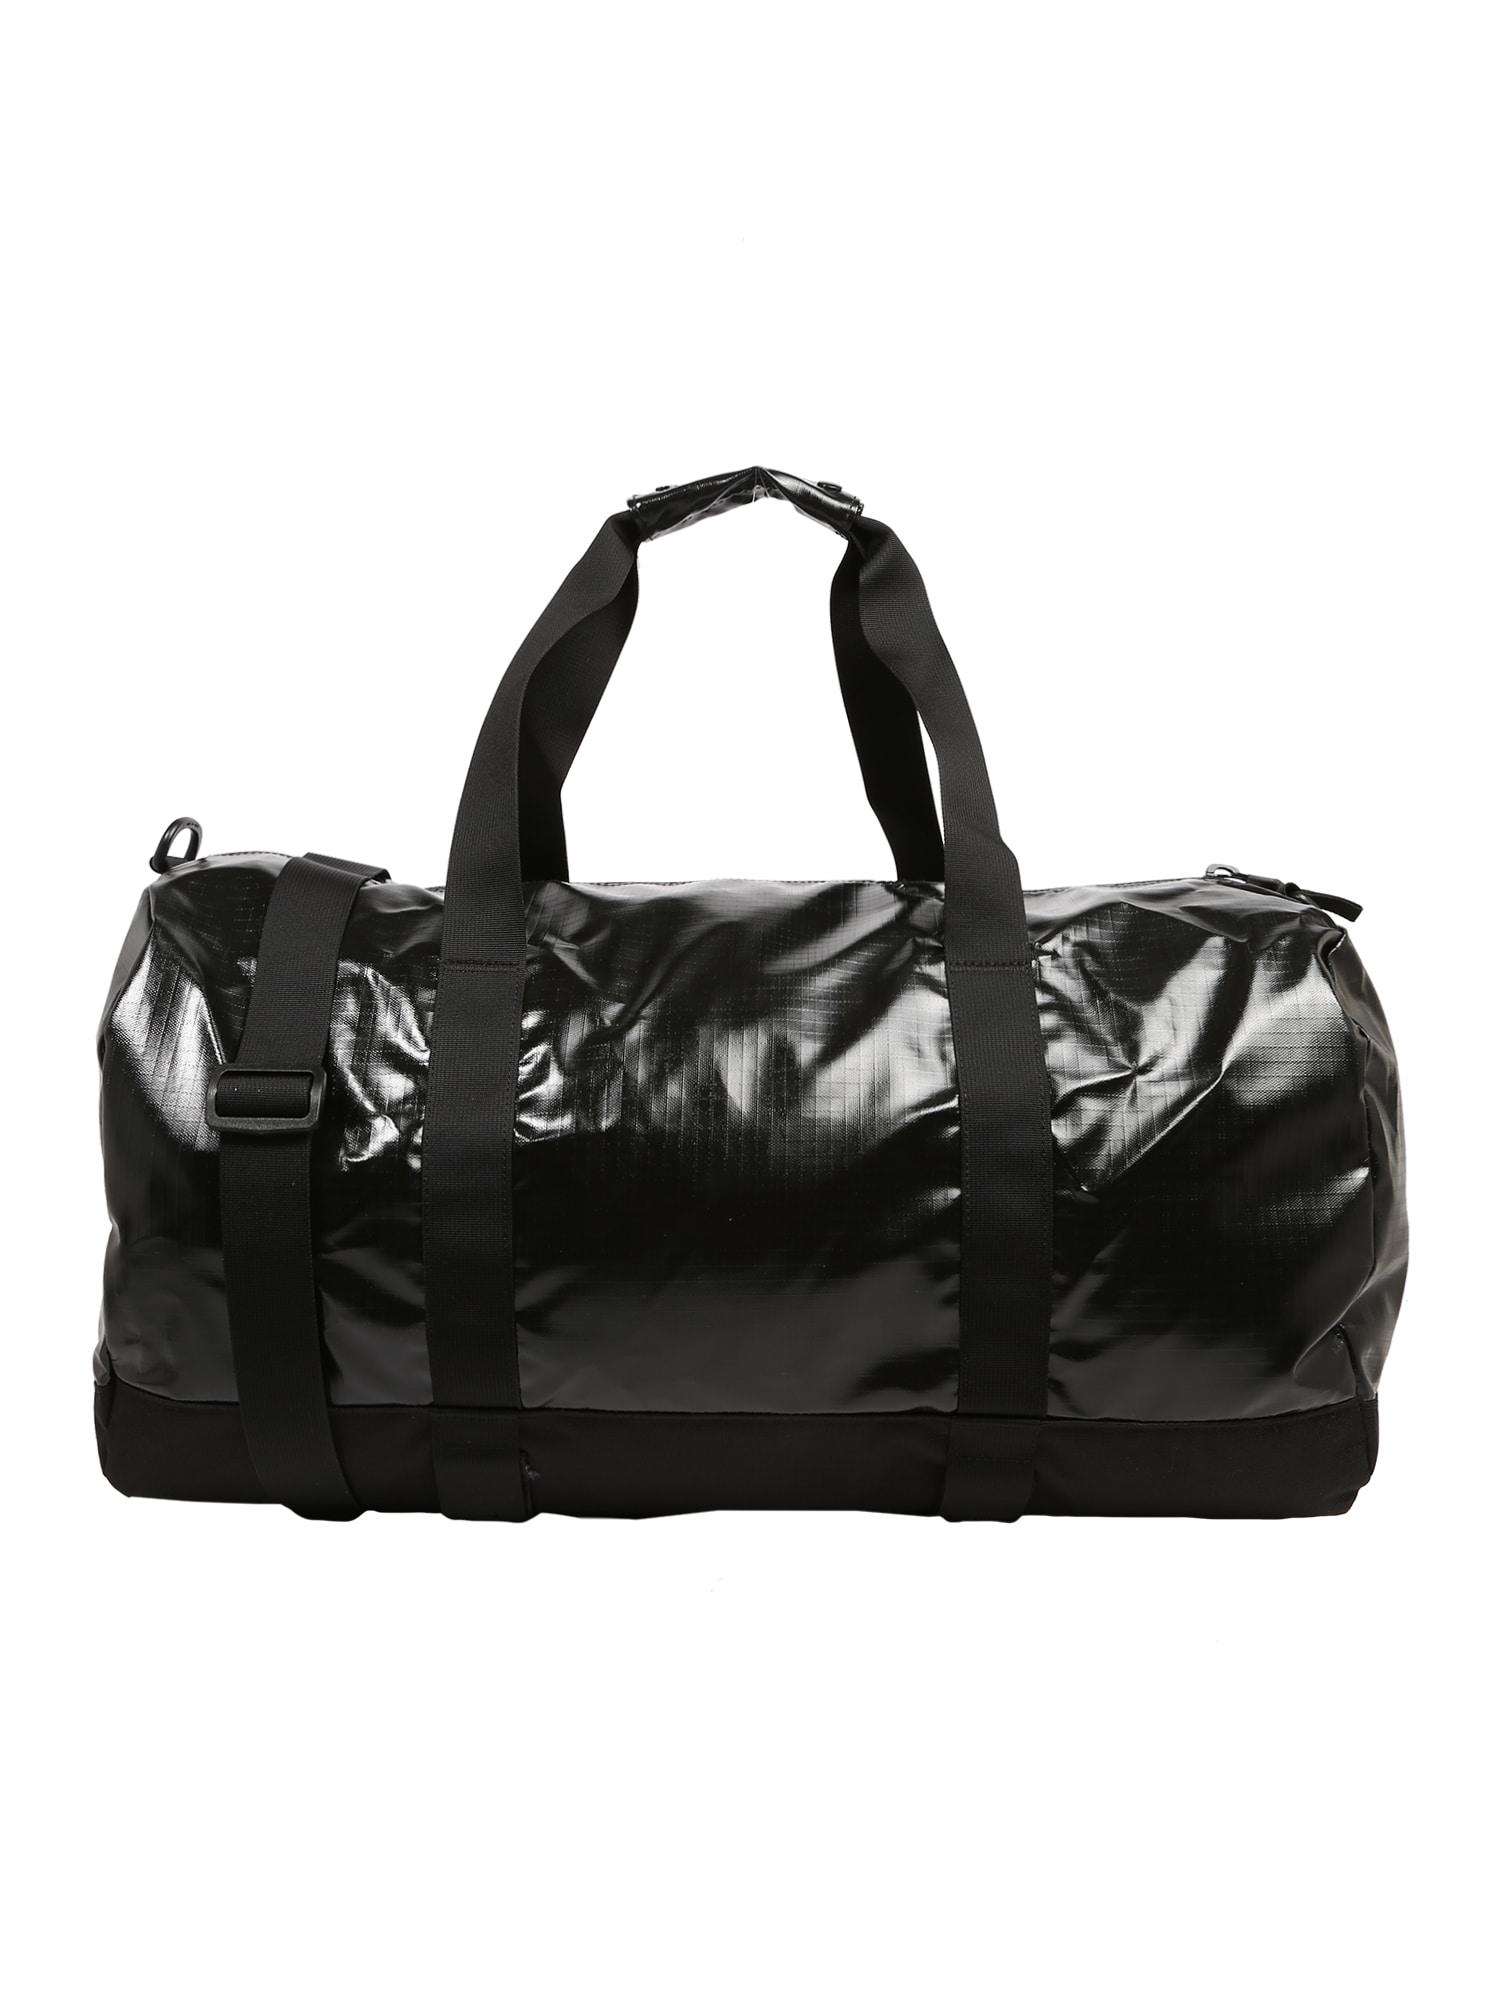 Cestovní taška NEWDUFFEL černá ADIDAS ORIGINALS